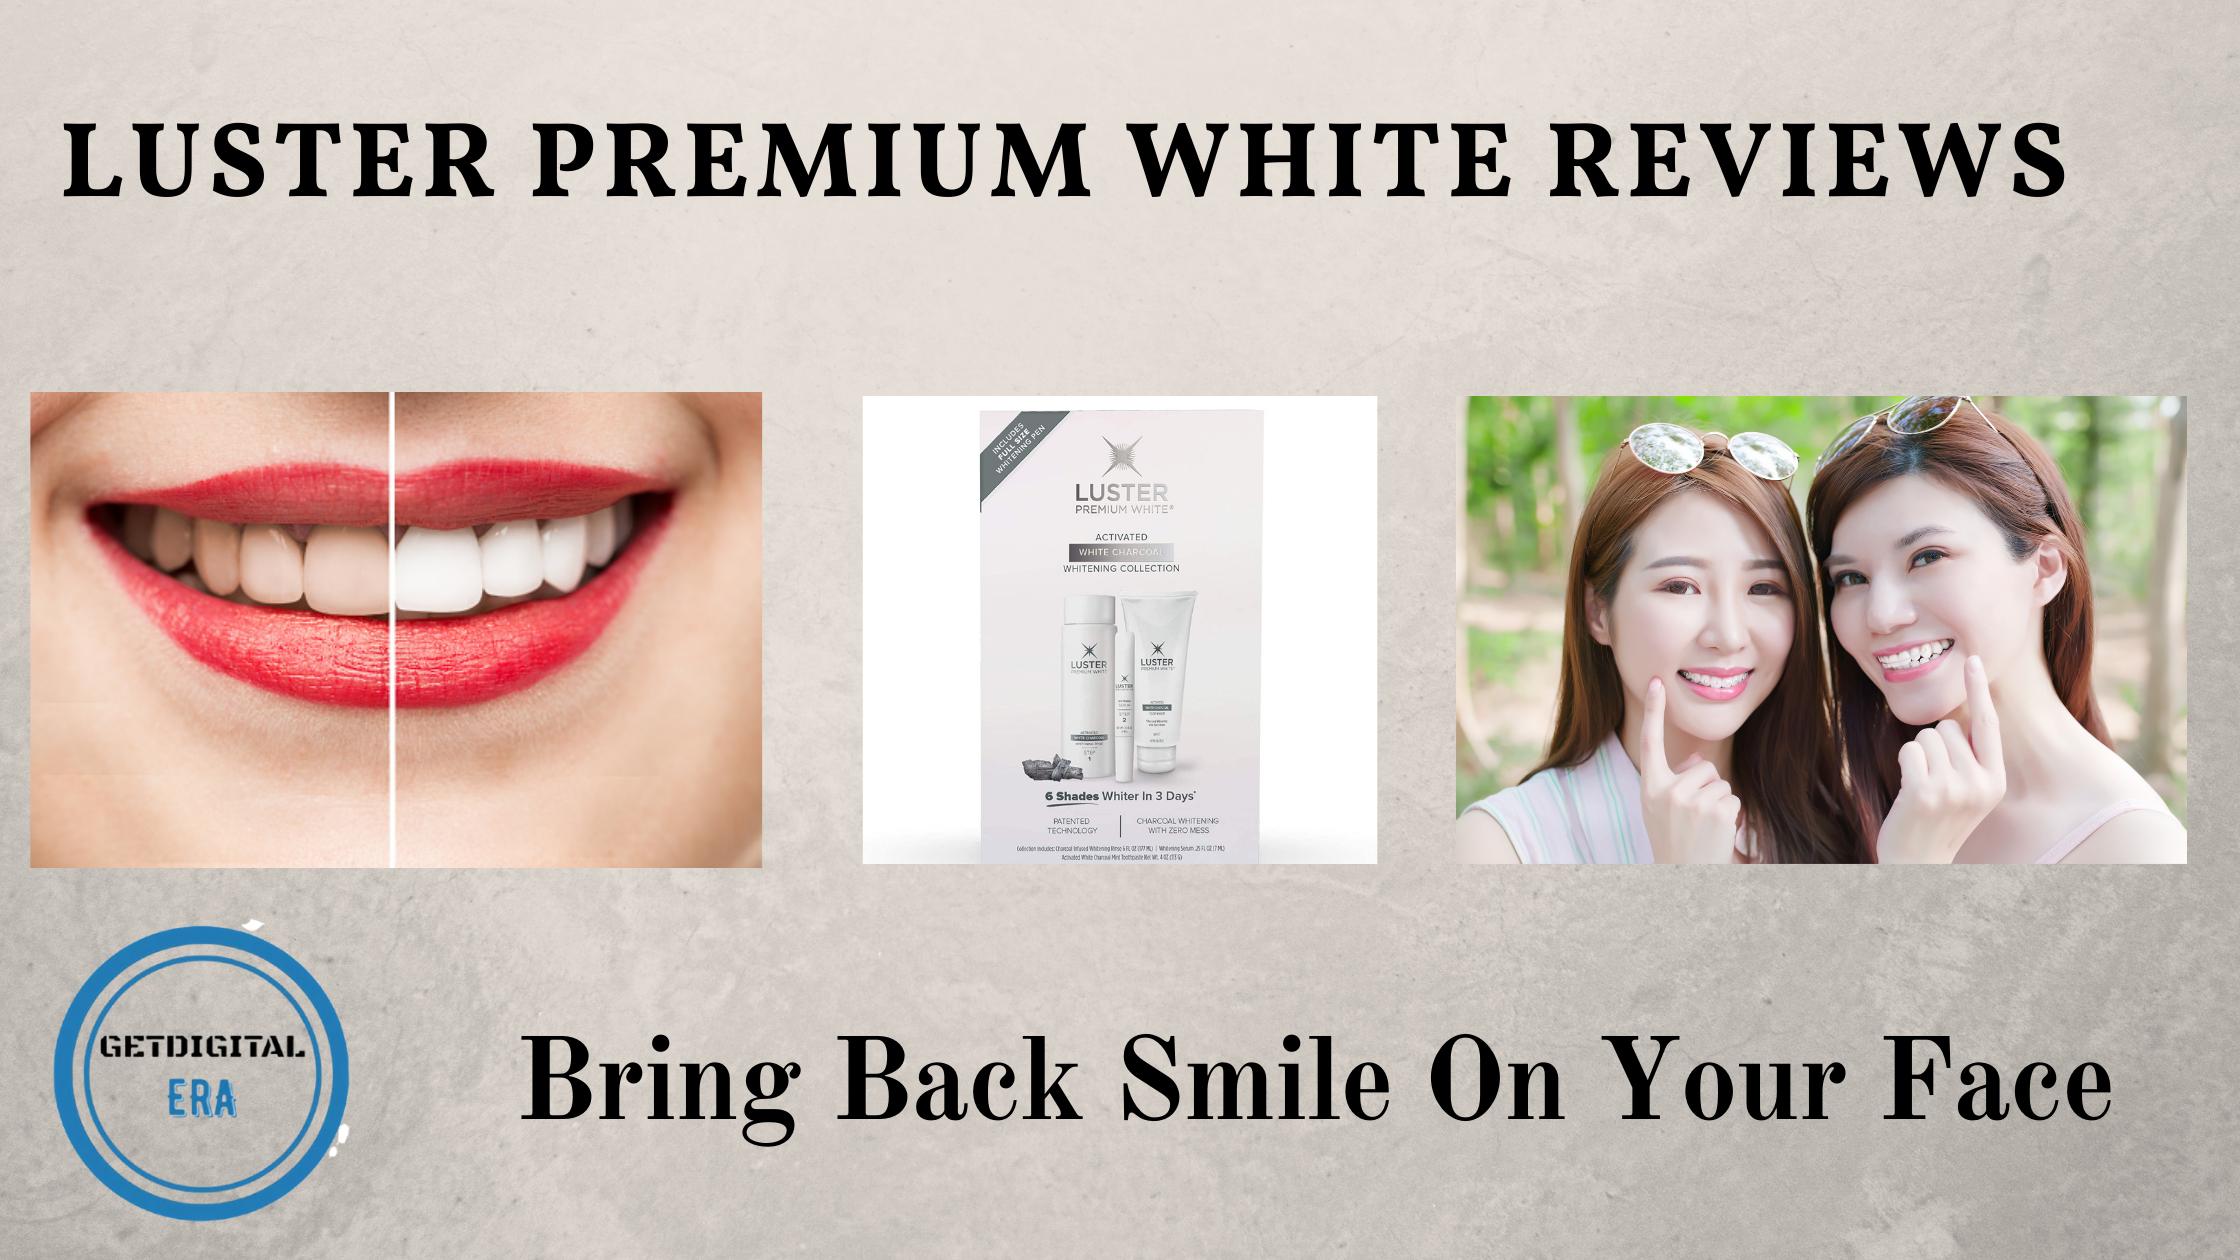 Luster Premium White Reviews